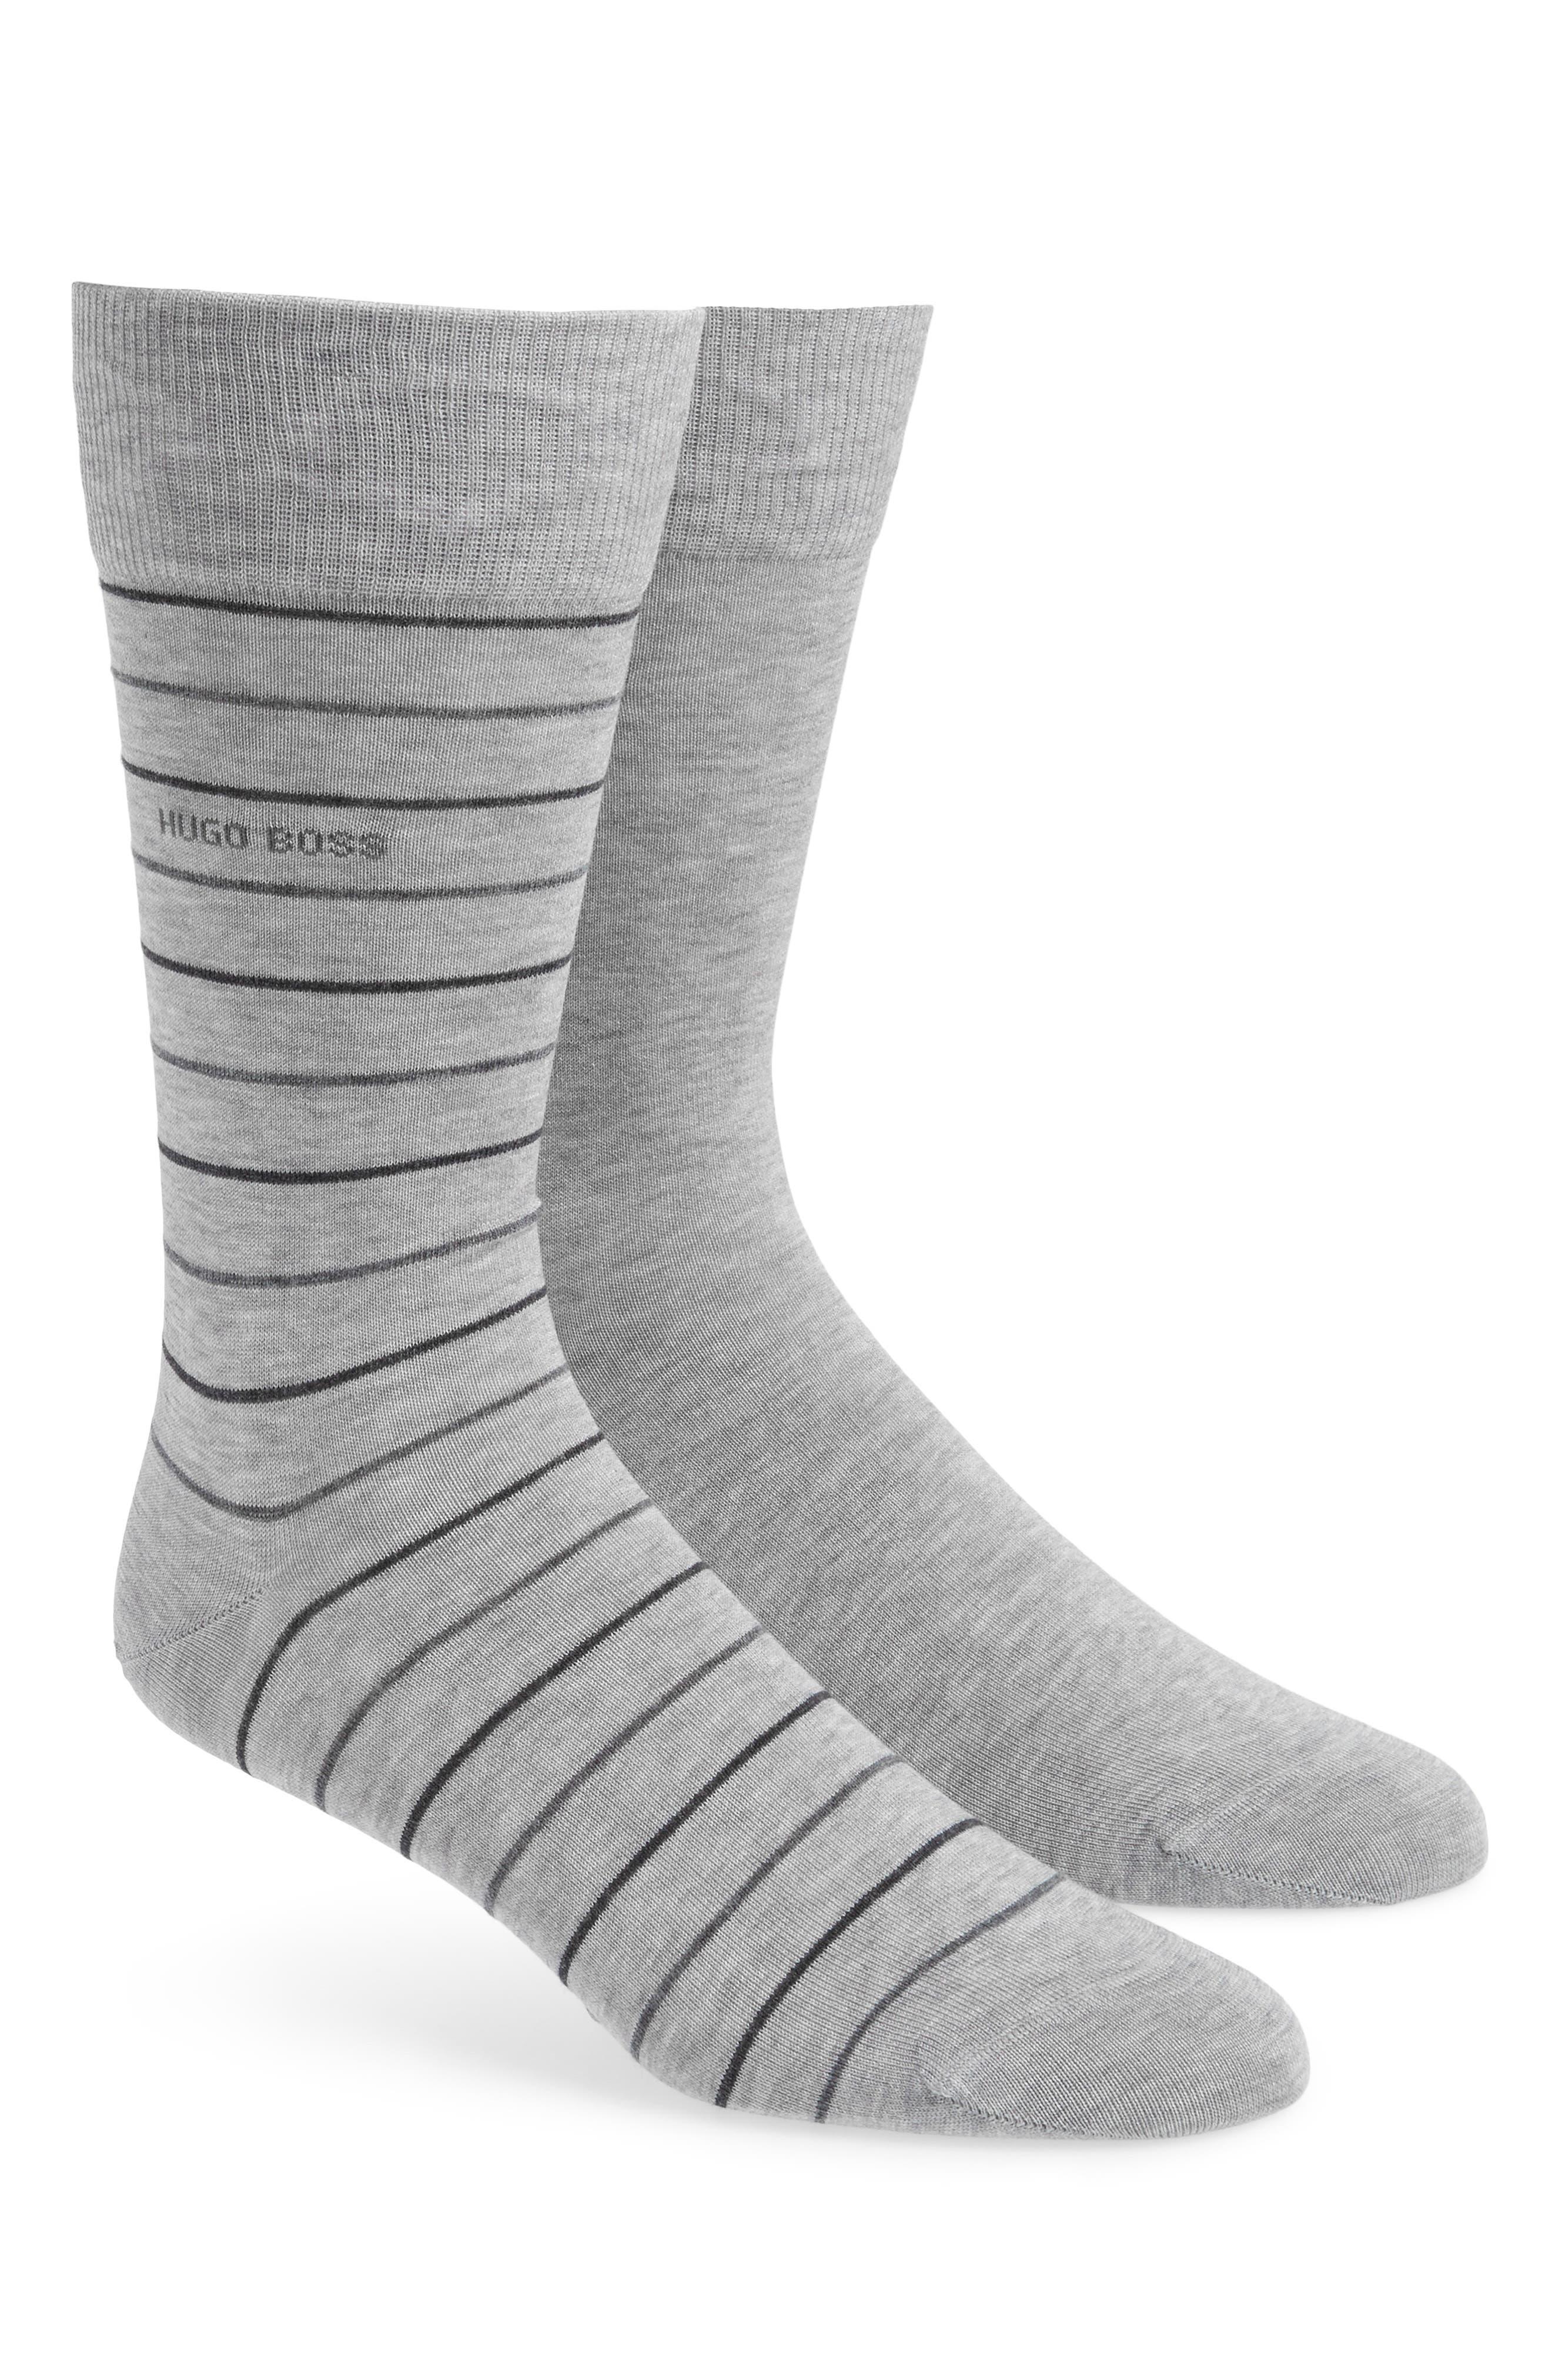 Assorted 2-Pack Socks,                             Main thumbnail 1, color,                             GREY